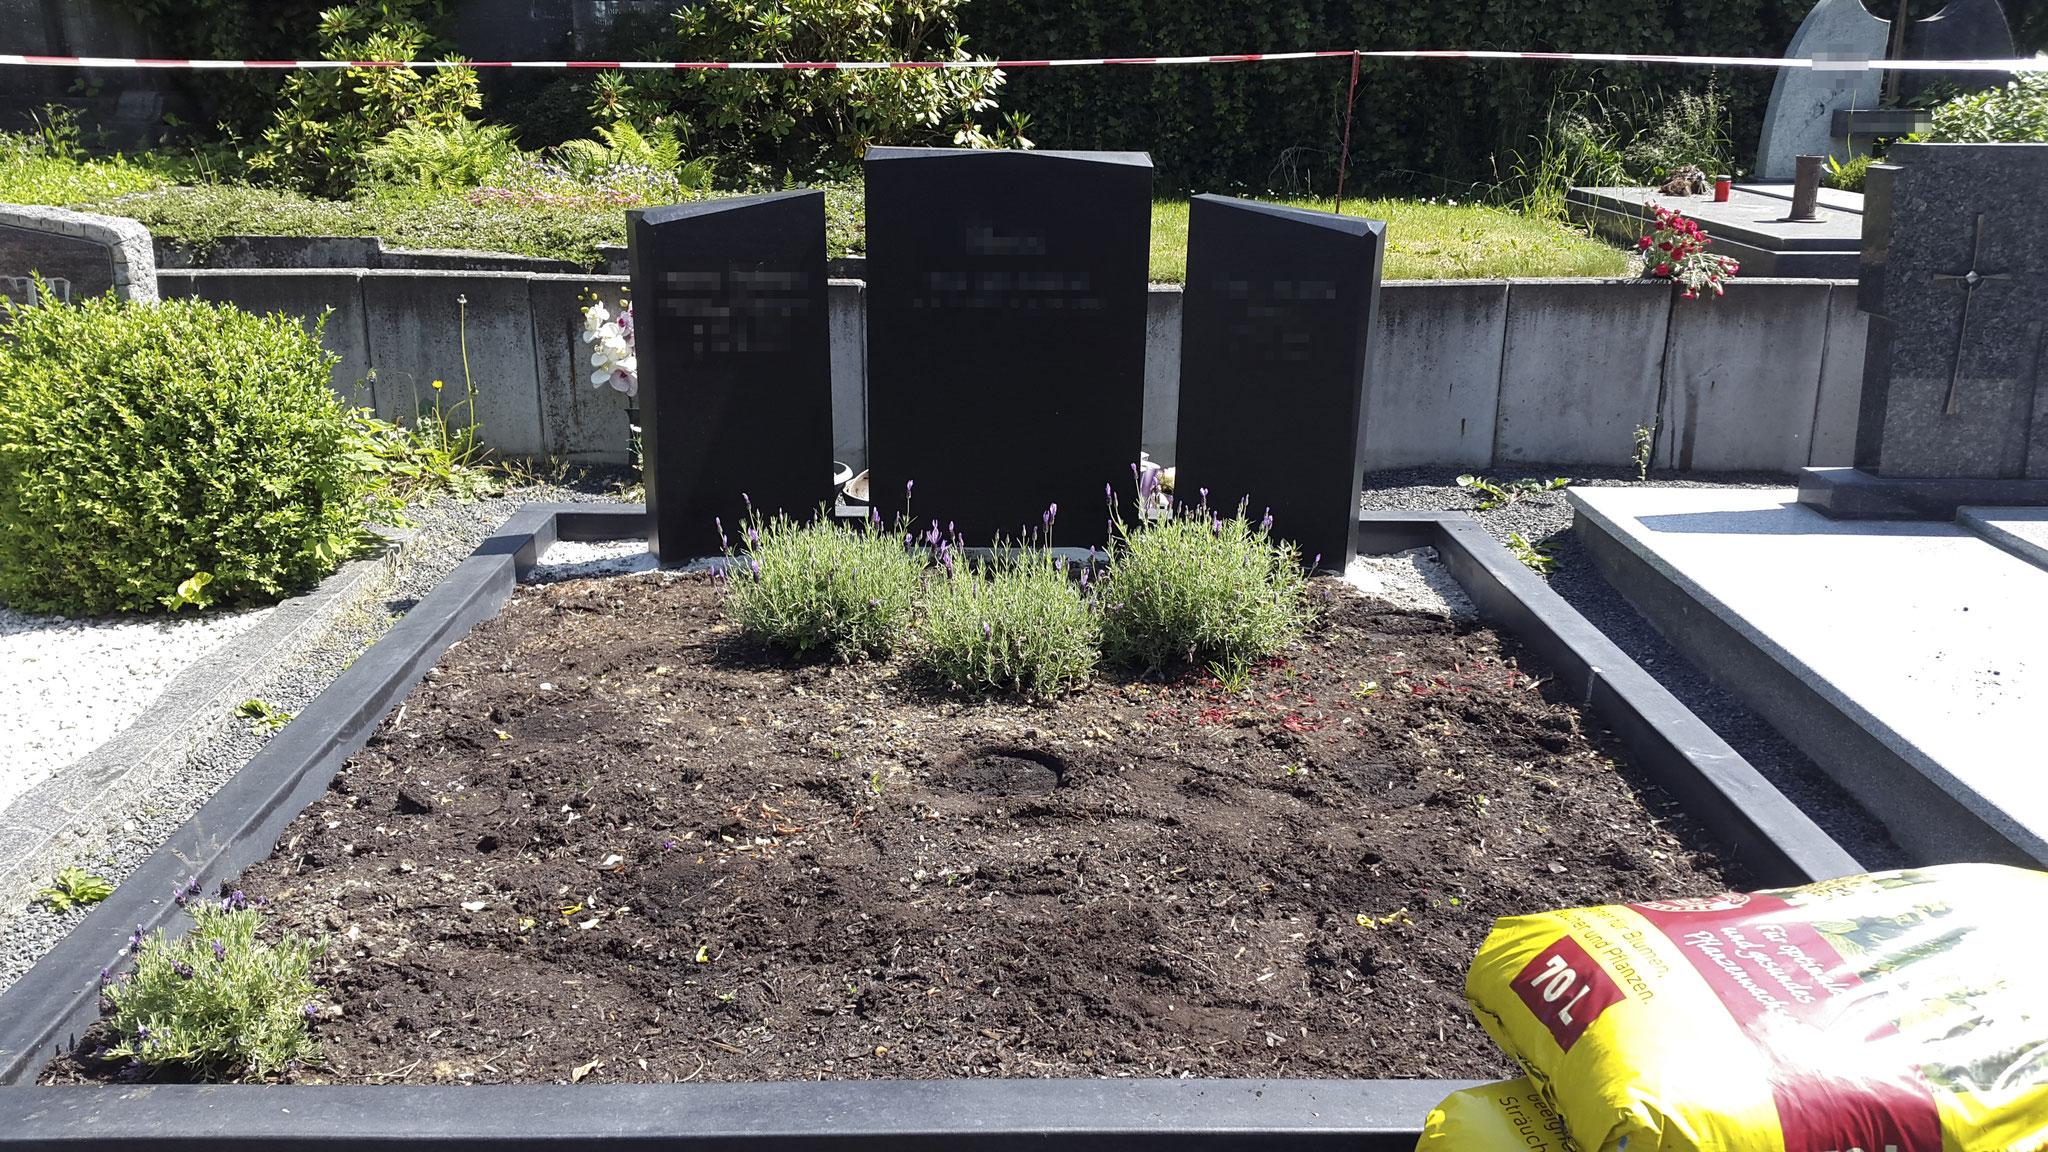 Grabbepflanzung pflege gartengestaltung saliger for Gartengestaltung app